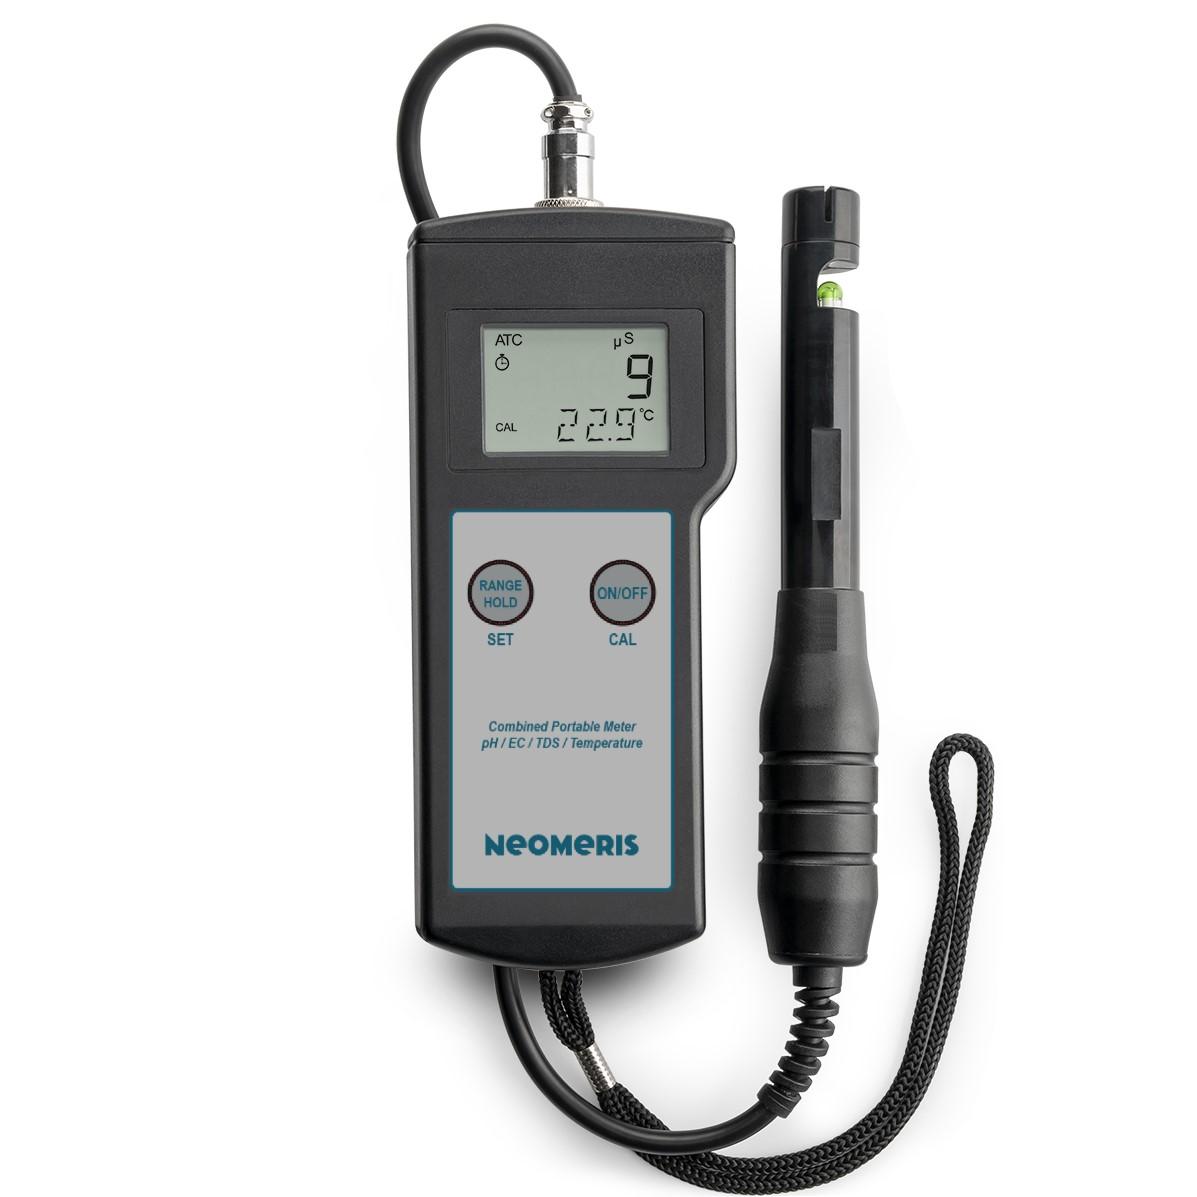 Neomeris Kombitestgerät pH/EC/TDS/Temperatur